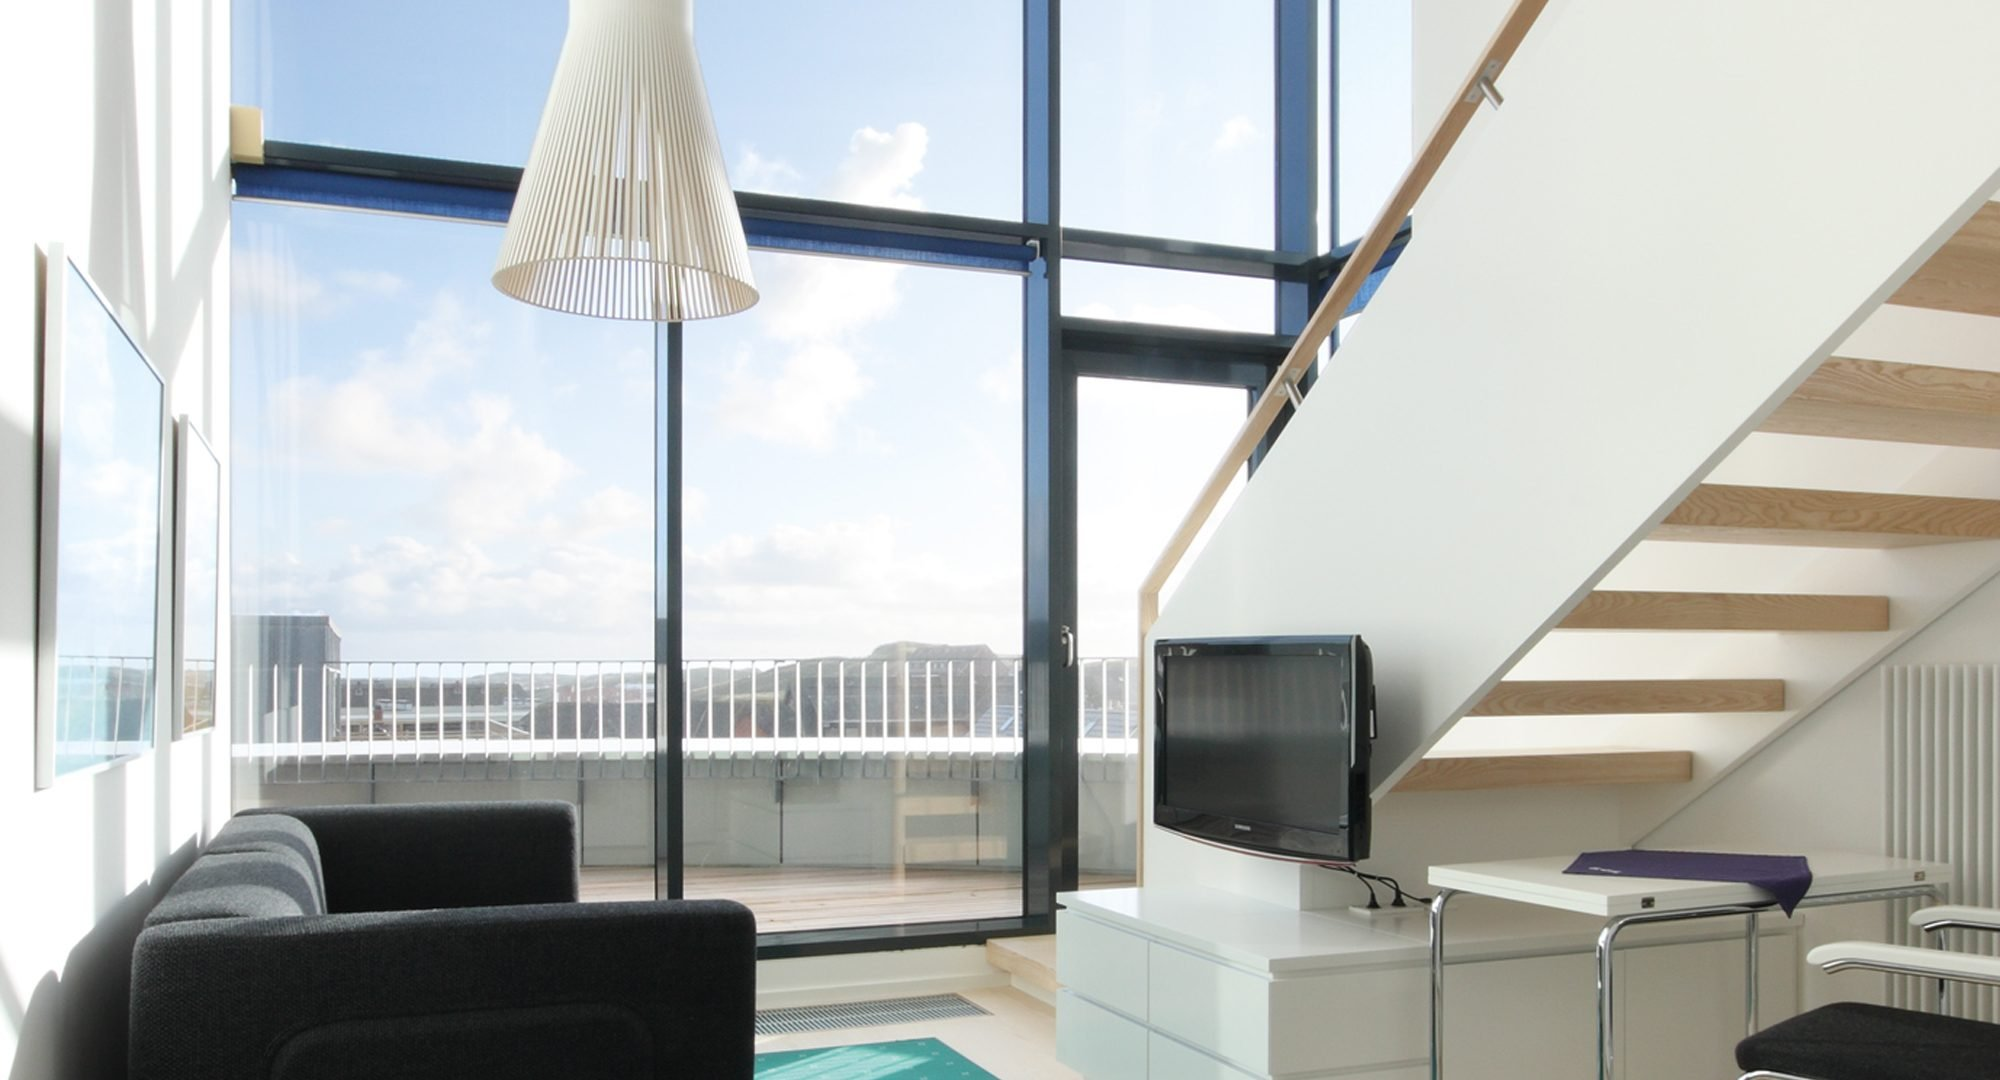 Hotel Niedersachsen Sylt – Living Room